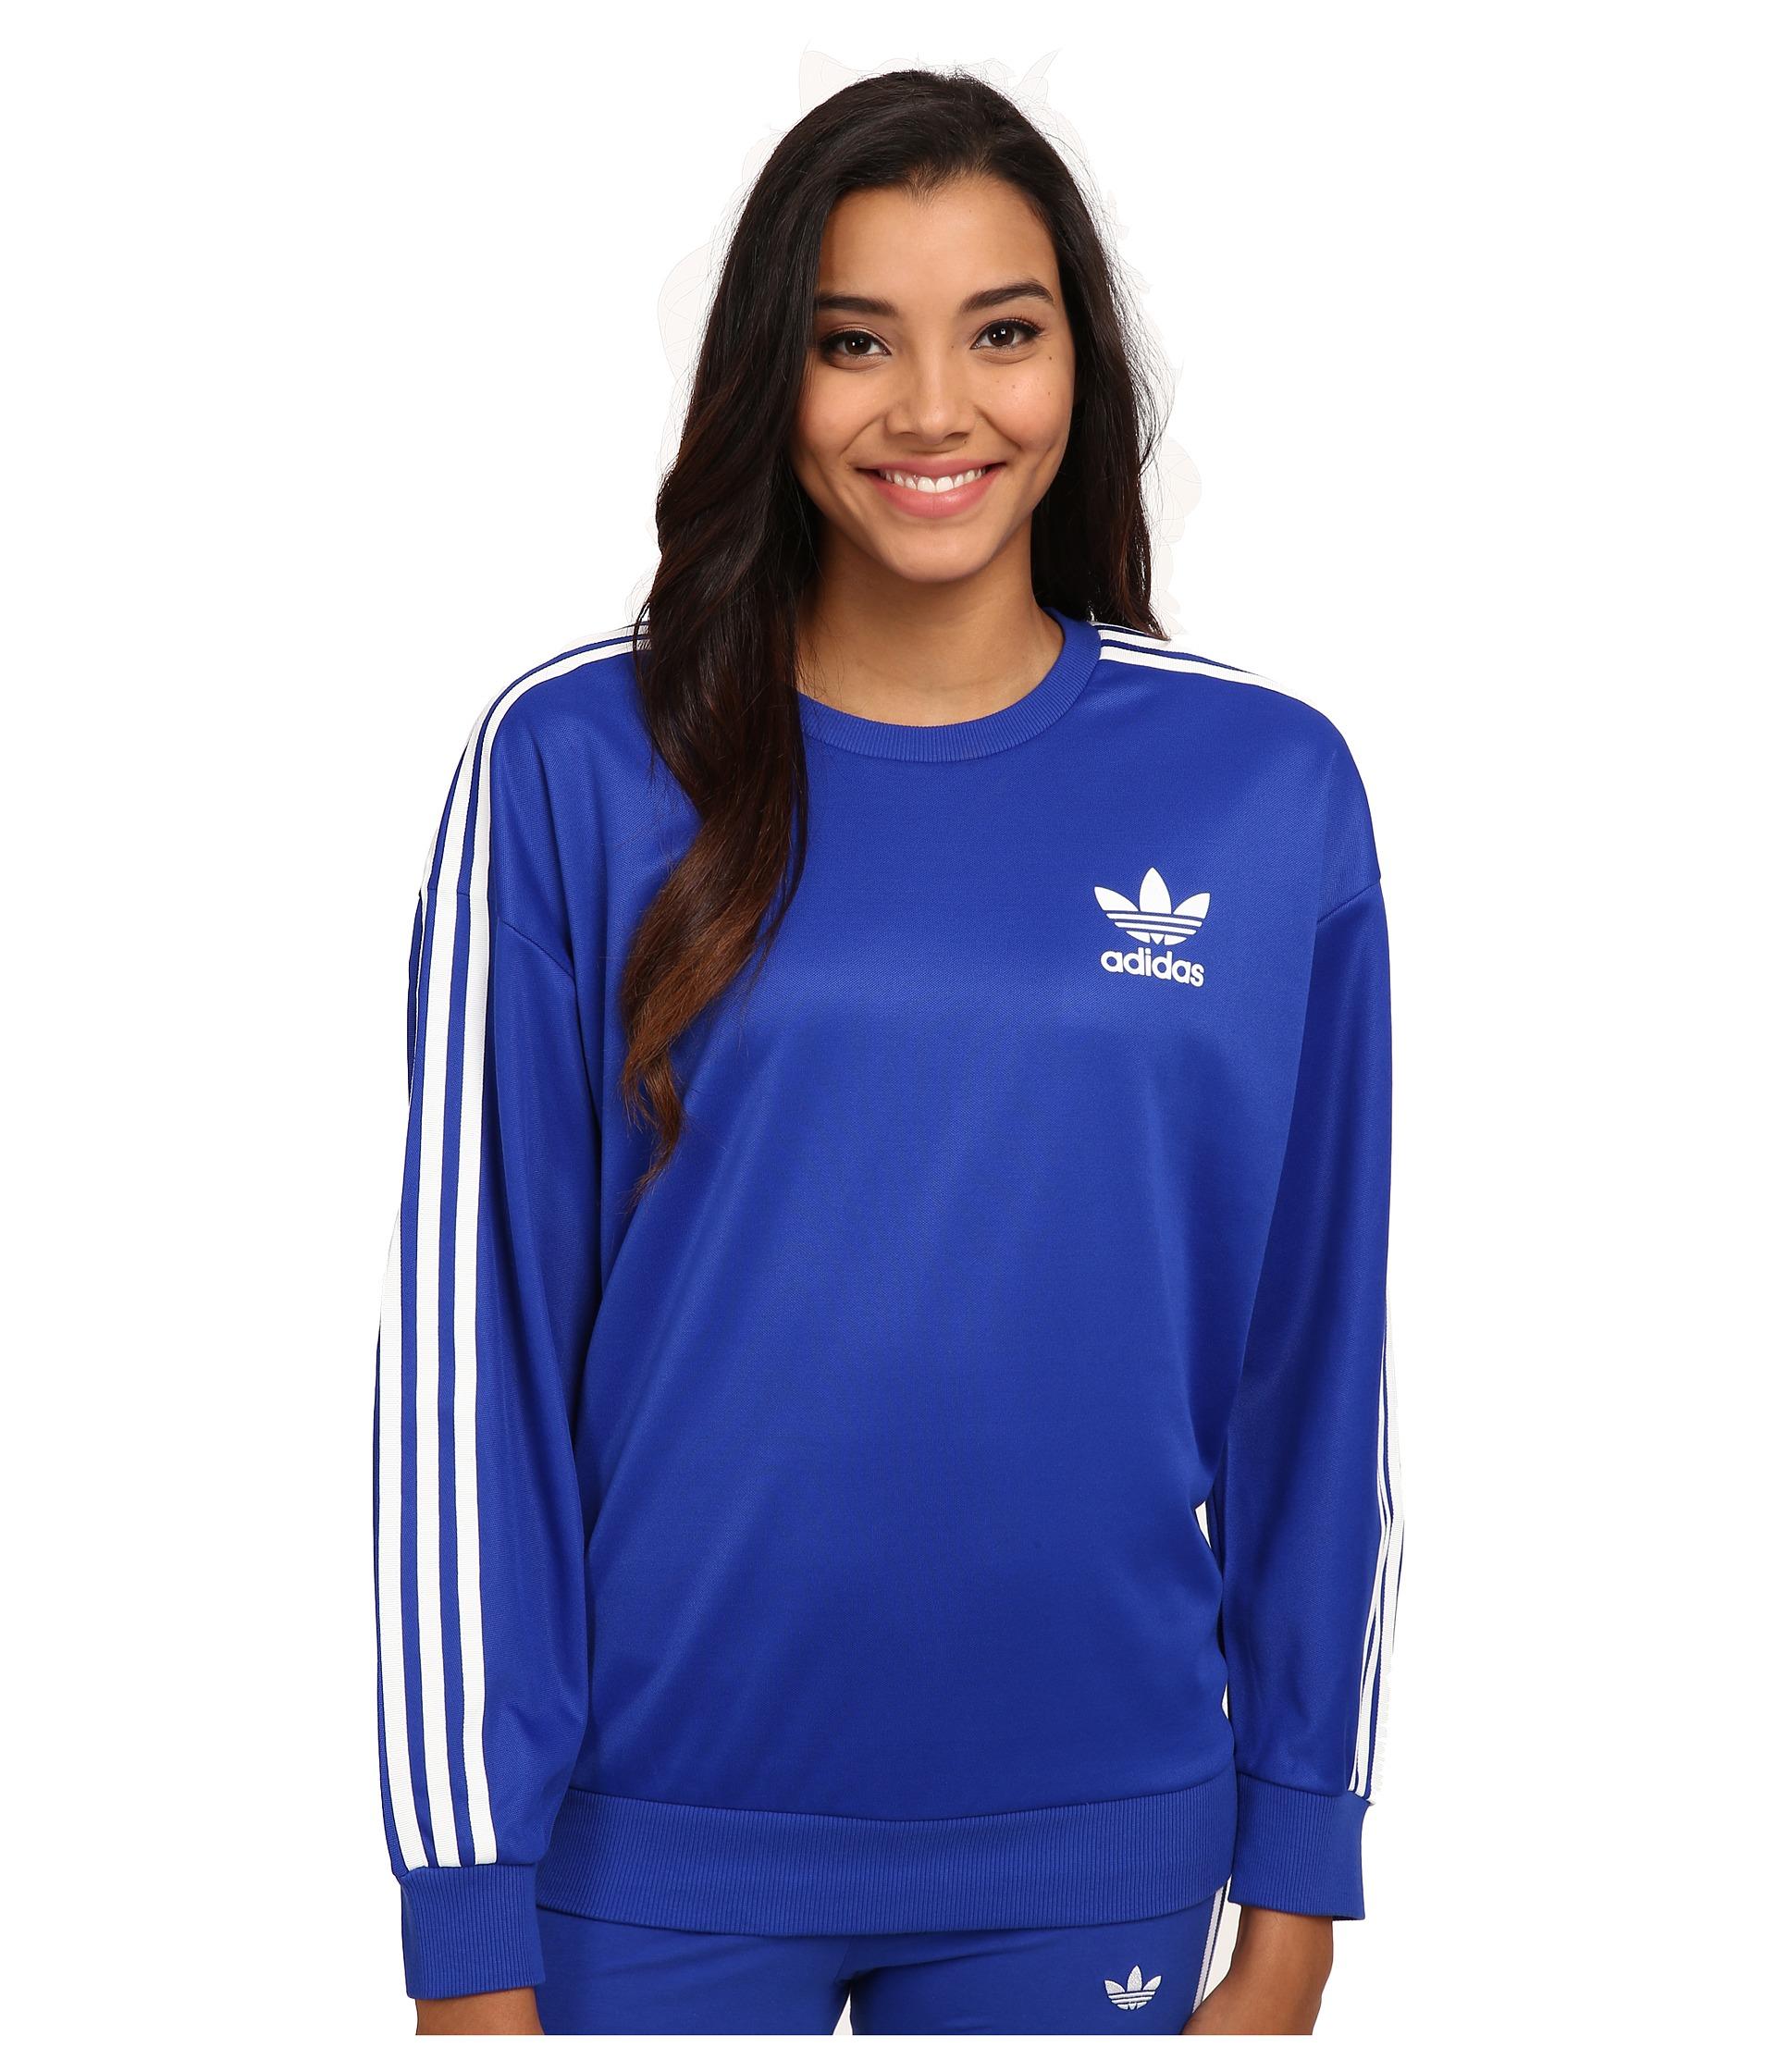 639c1cf8004c Lyst - adidas Originals 3-stripes Sweatshirt in Blue